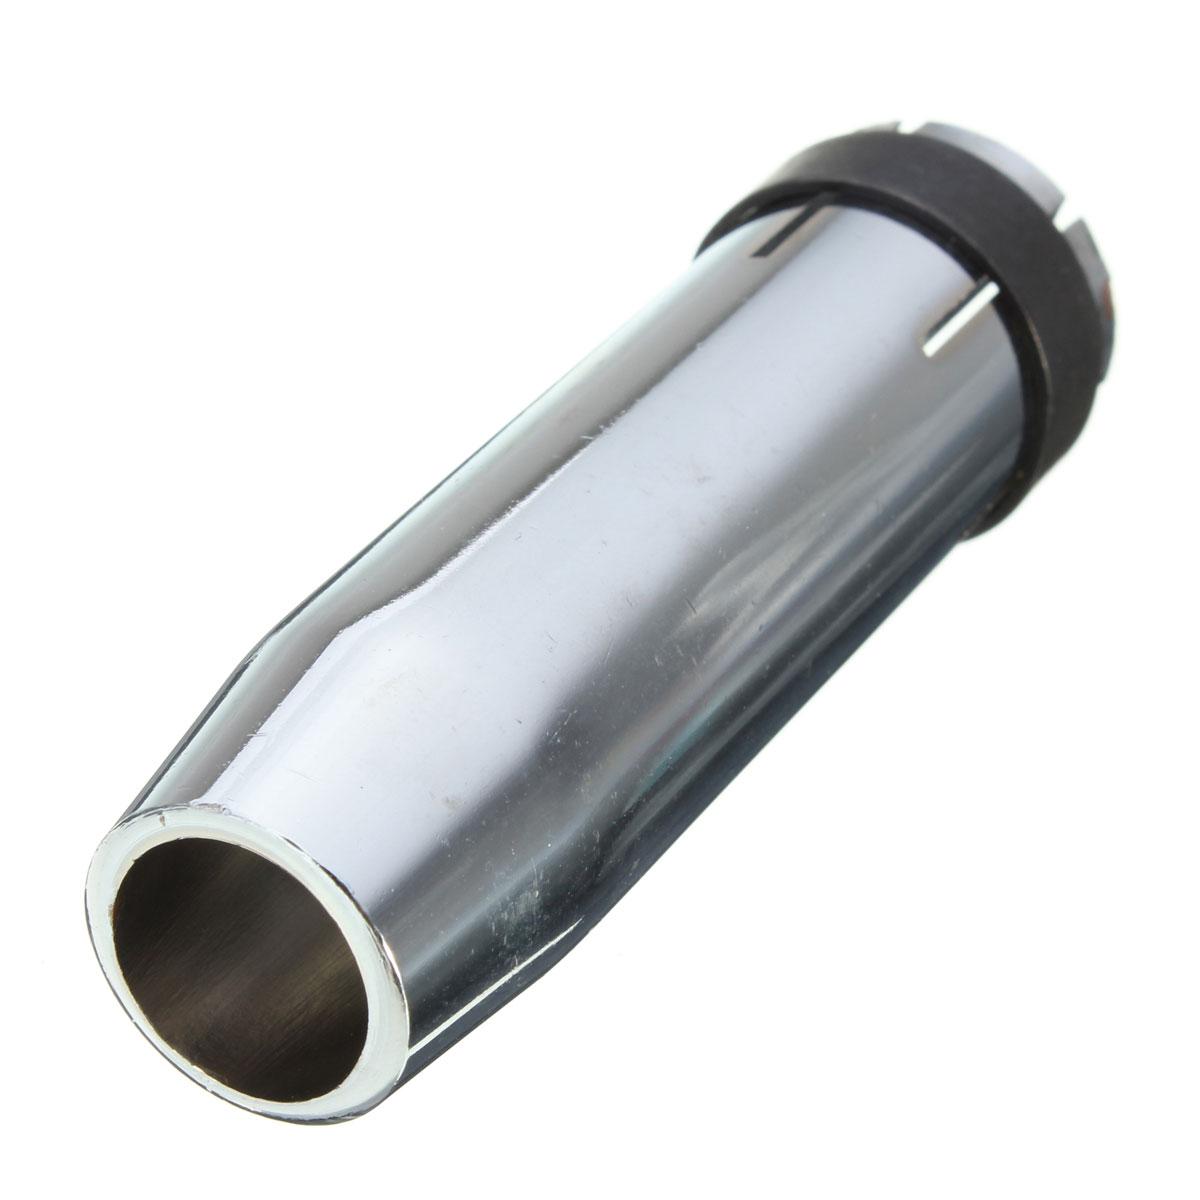 mig-gas-shroud--nozzle-binzel-style